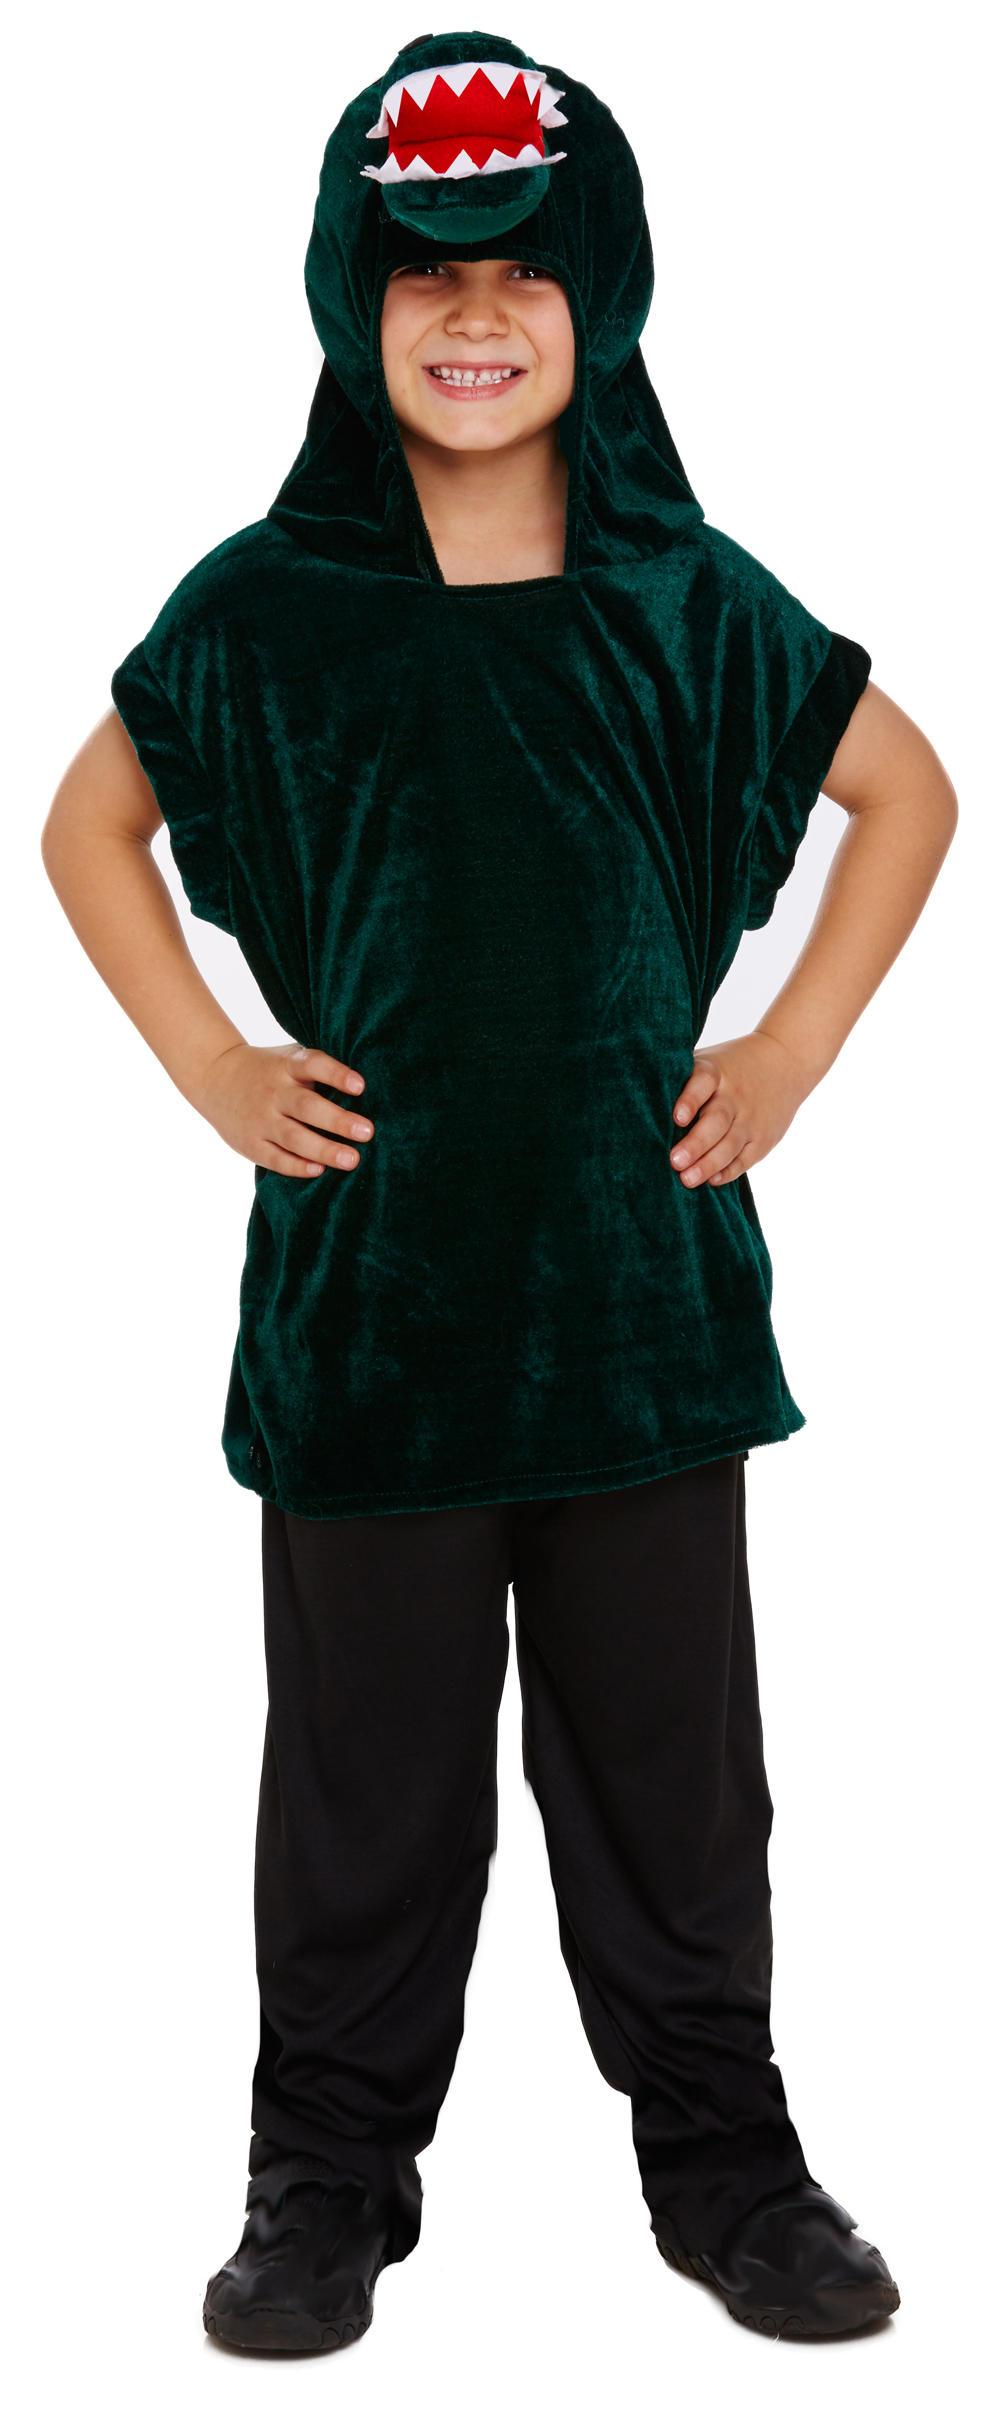 Crocodile Boys Fancy Dress Dinosaur Alligator Animal Kids Childrens Costume Top